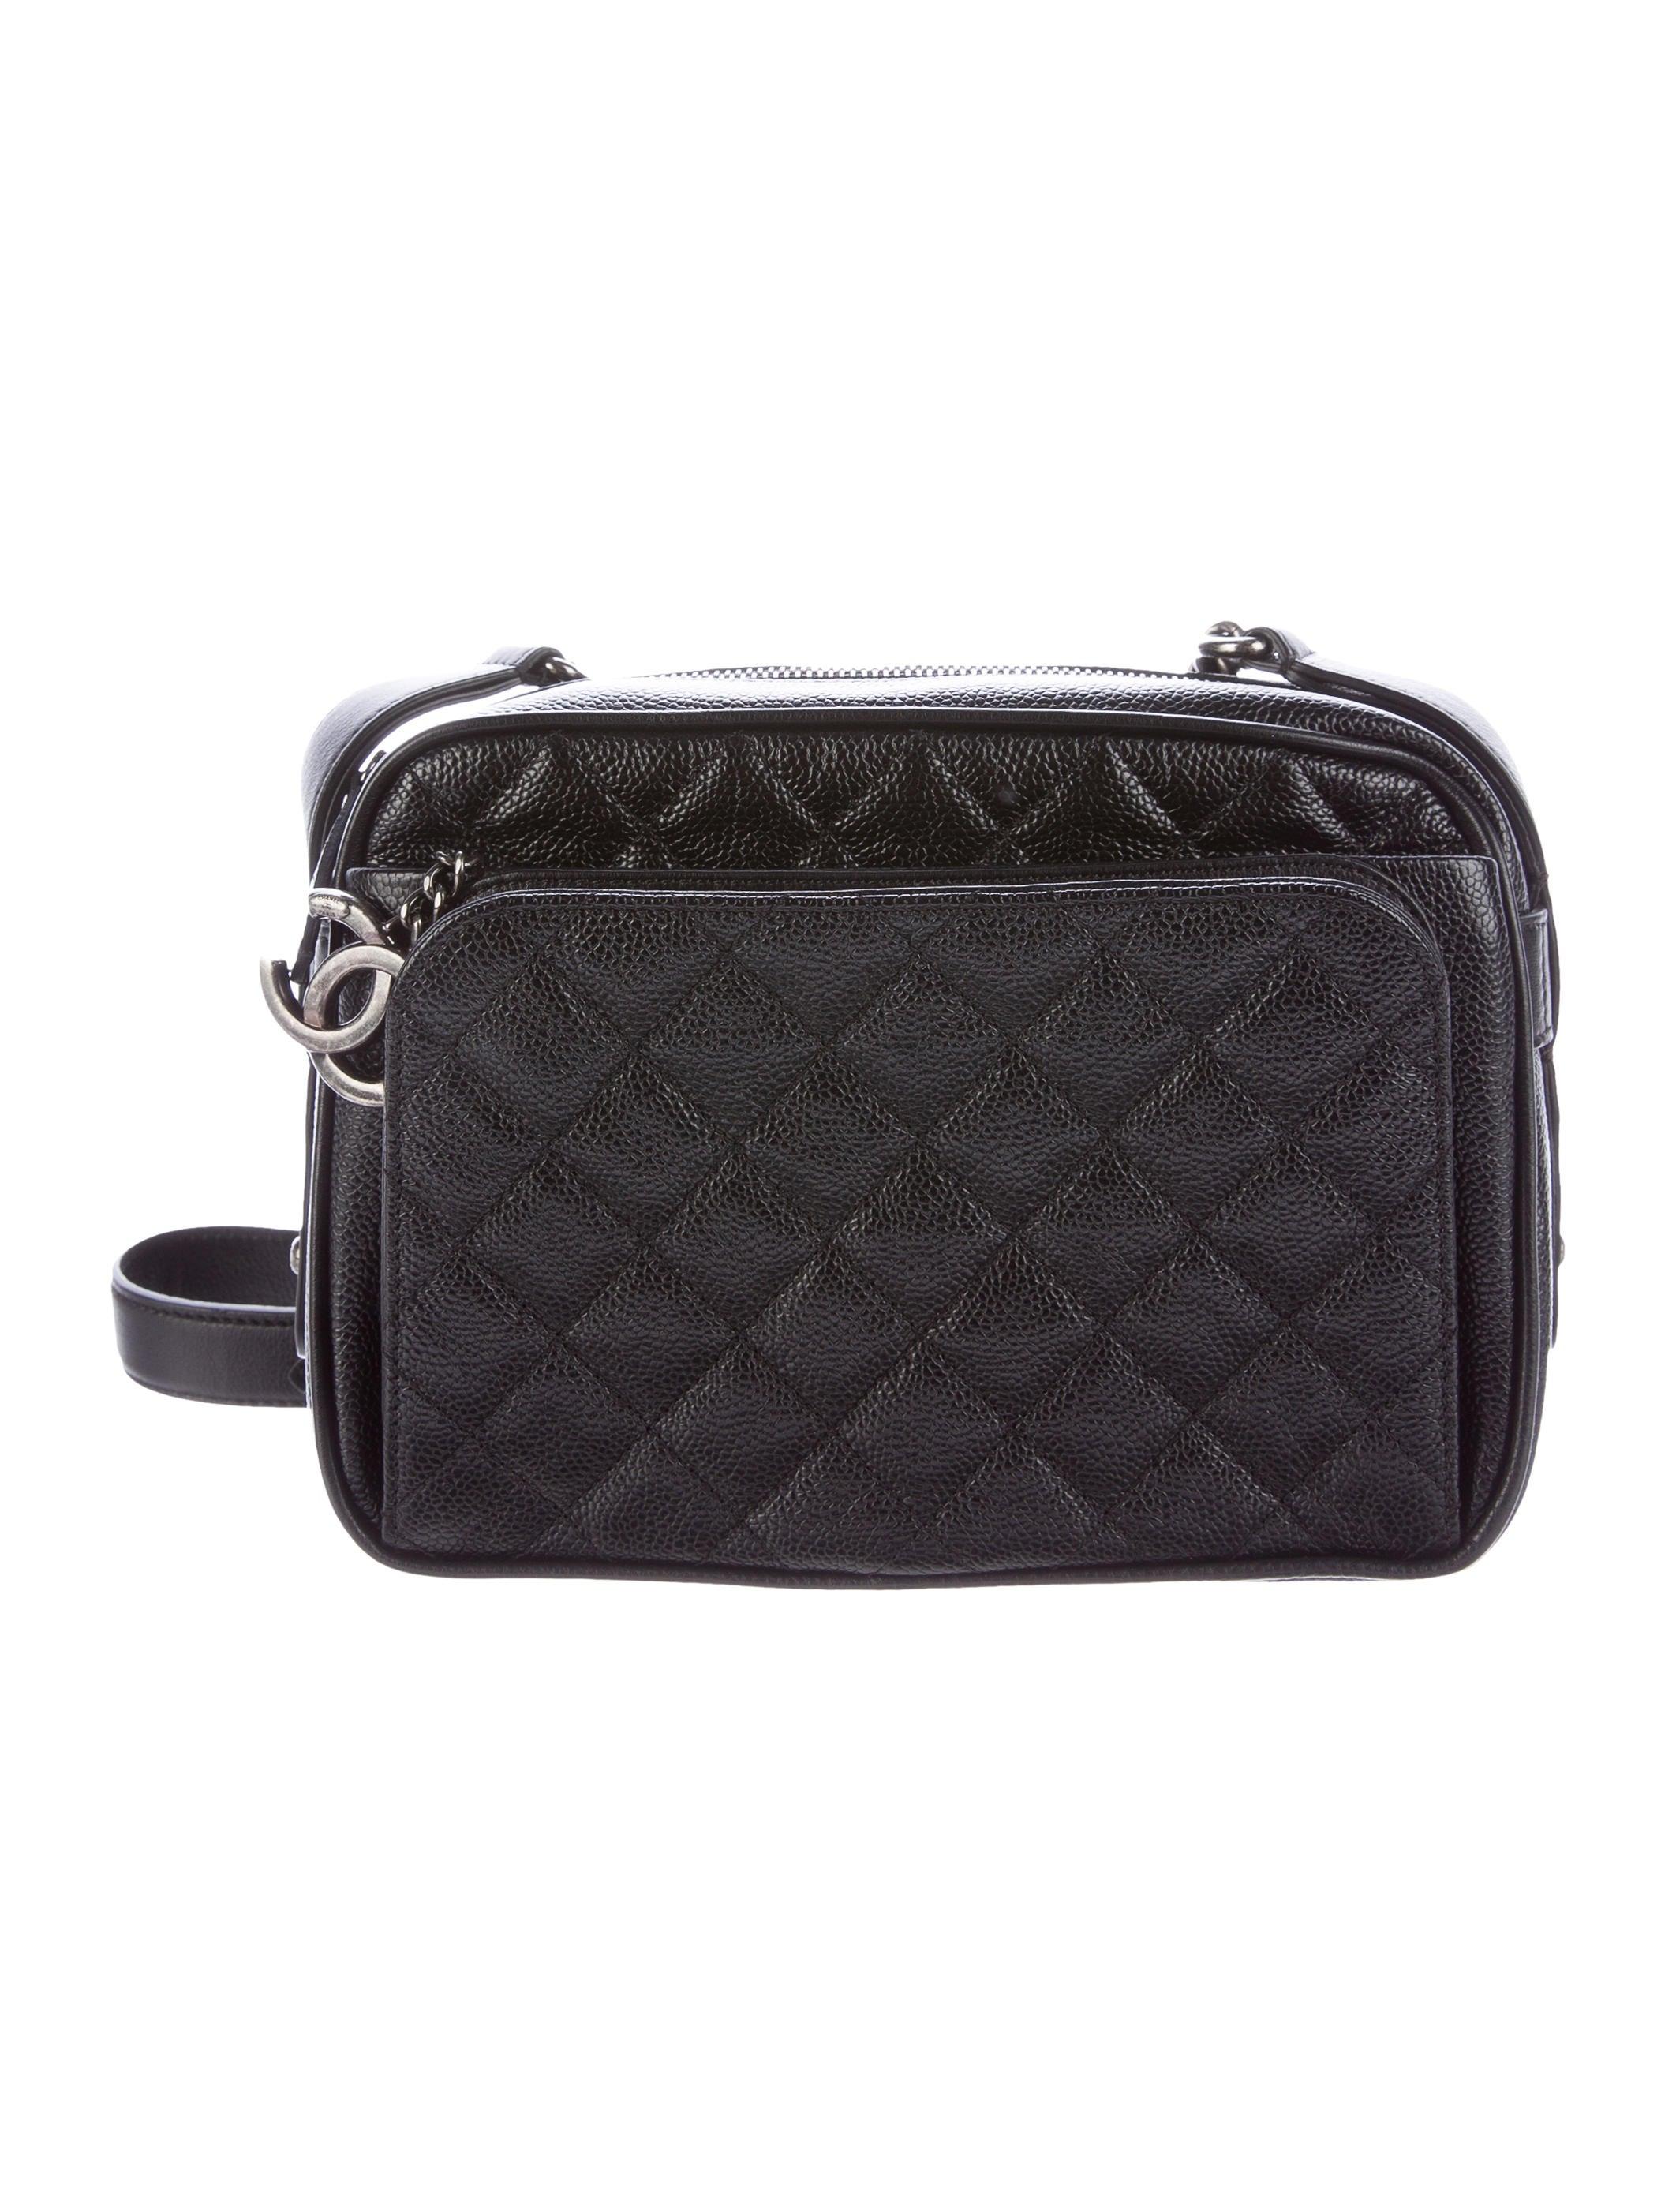 d782b516d6b9 Chanel 2016 Caviar Medium Business Trip Camera Bag - Handbags ...